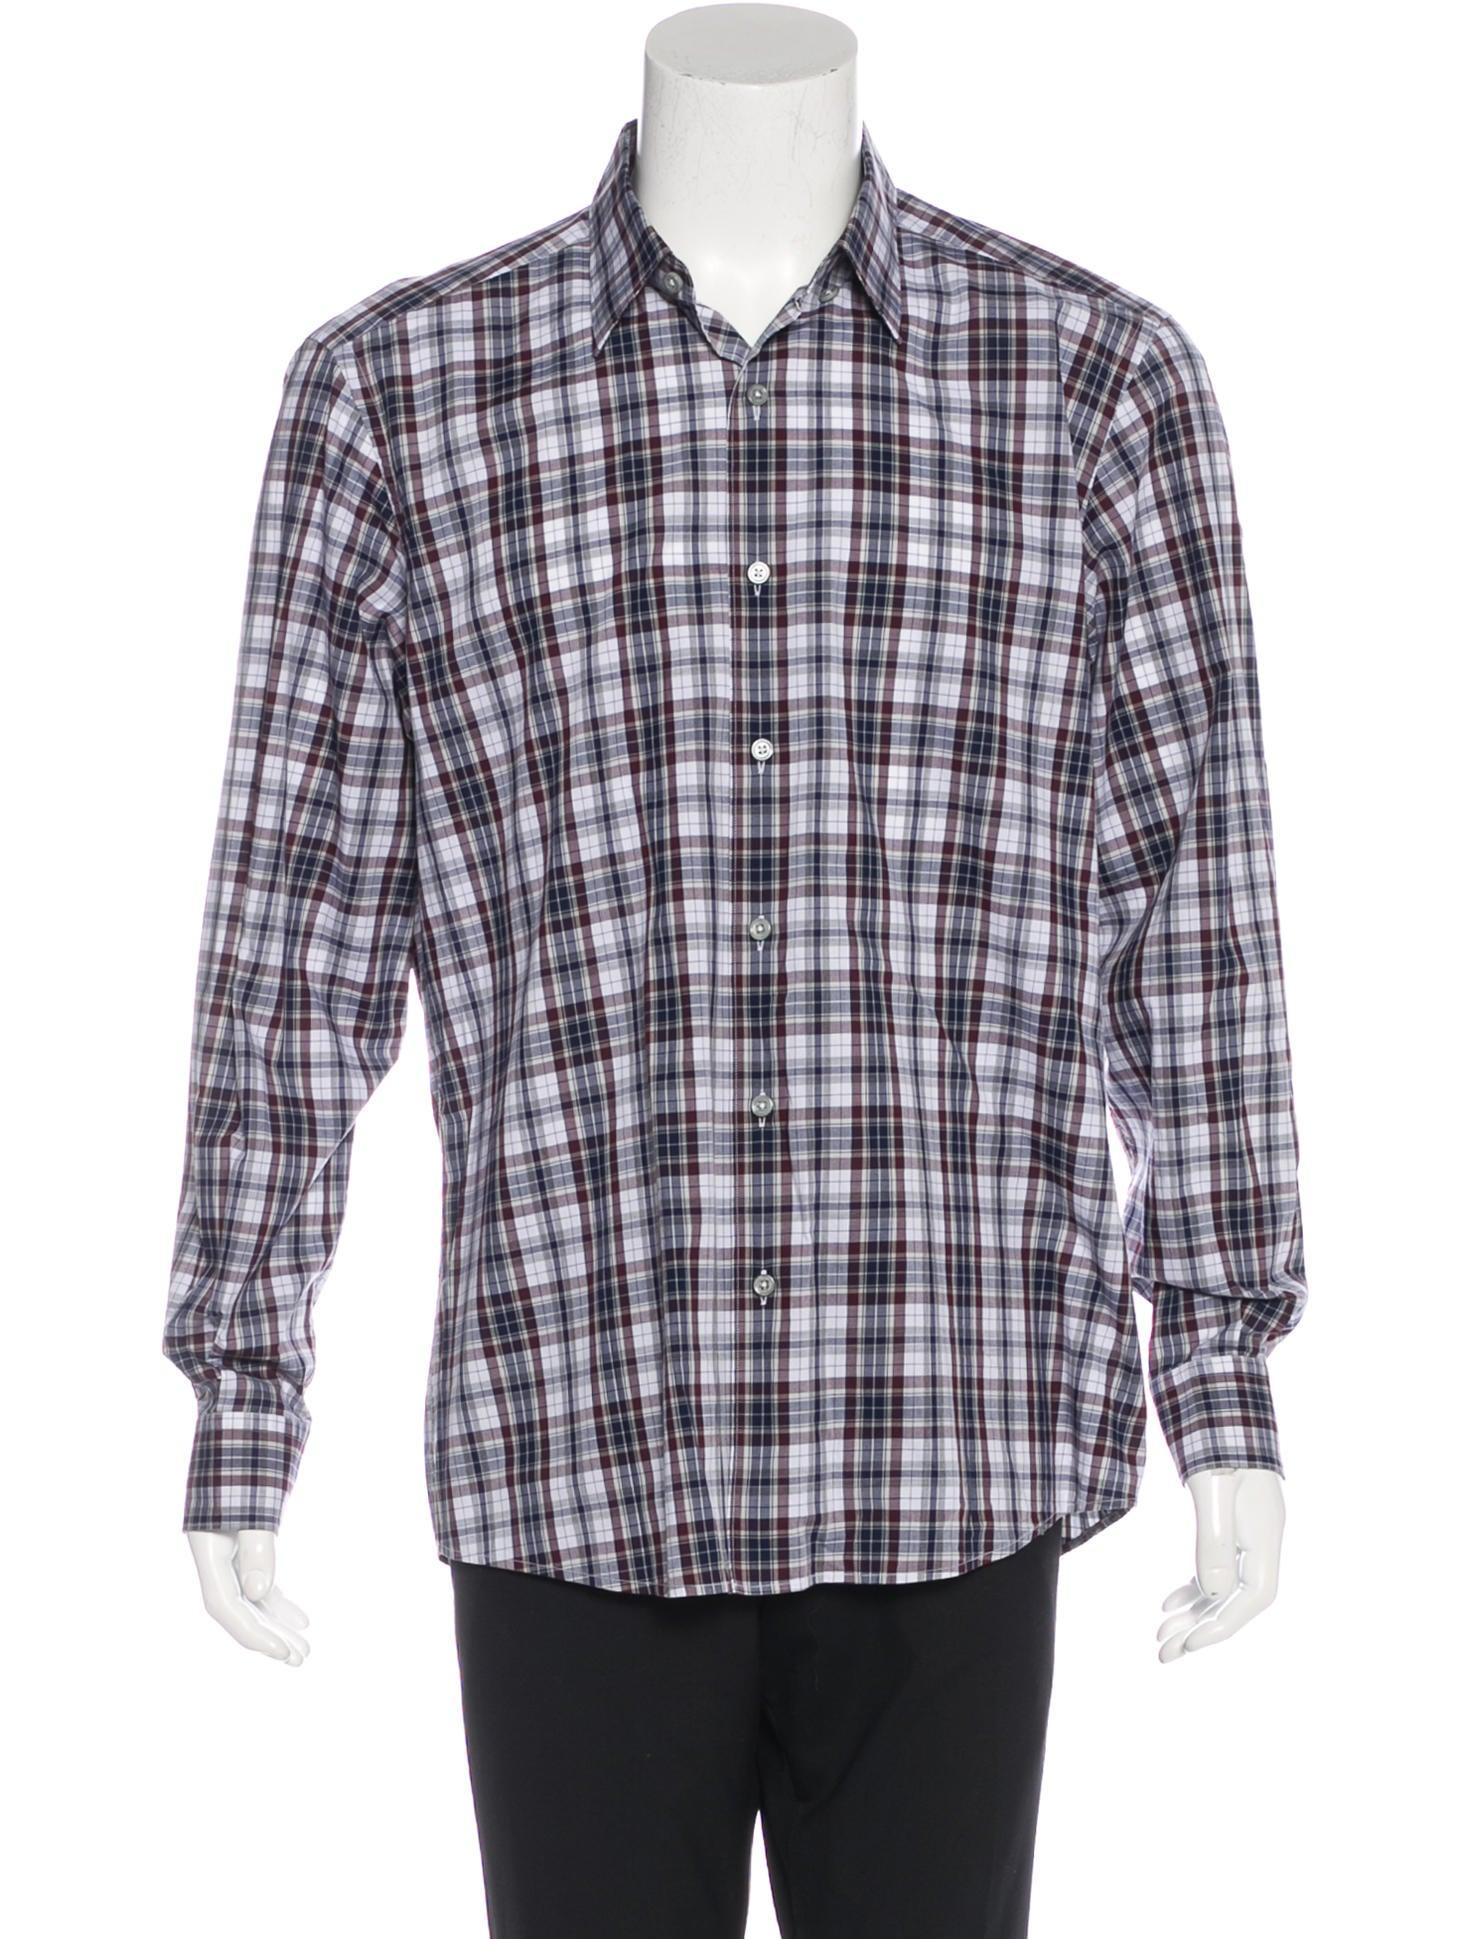 ermenegildo zegna plaid woven shirt clothing zgn24558 the realreal. Black Bedroom Furniture Sets. Home Design Ideas